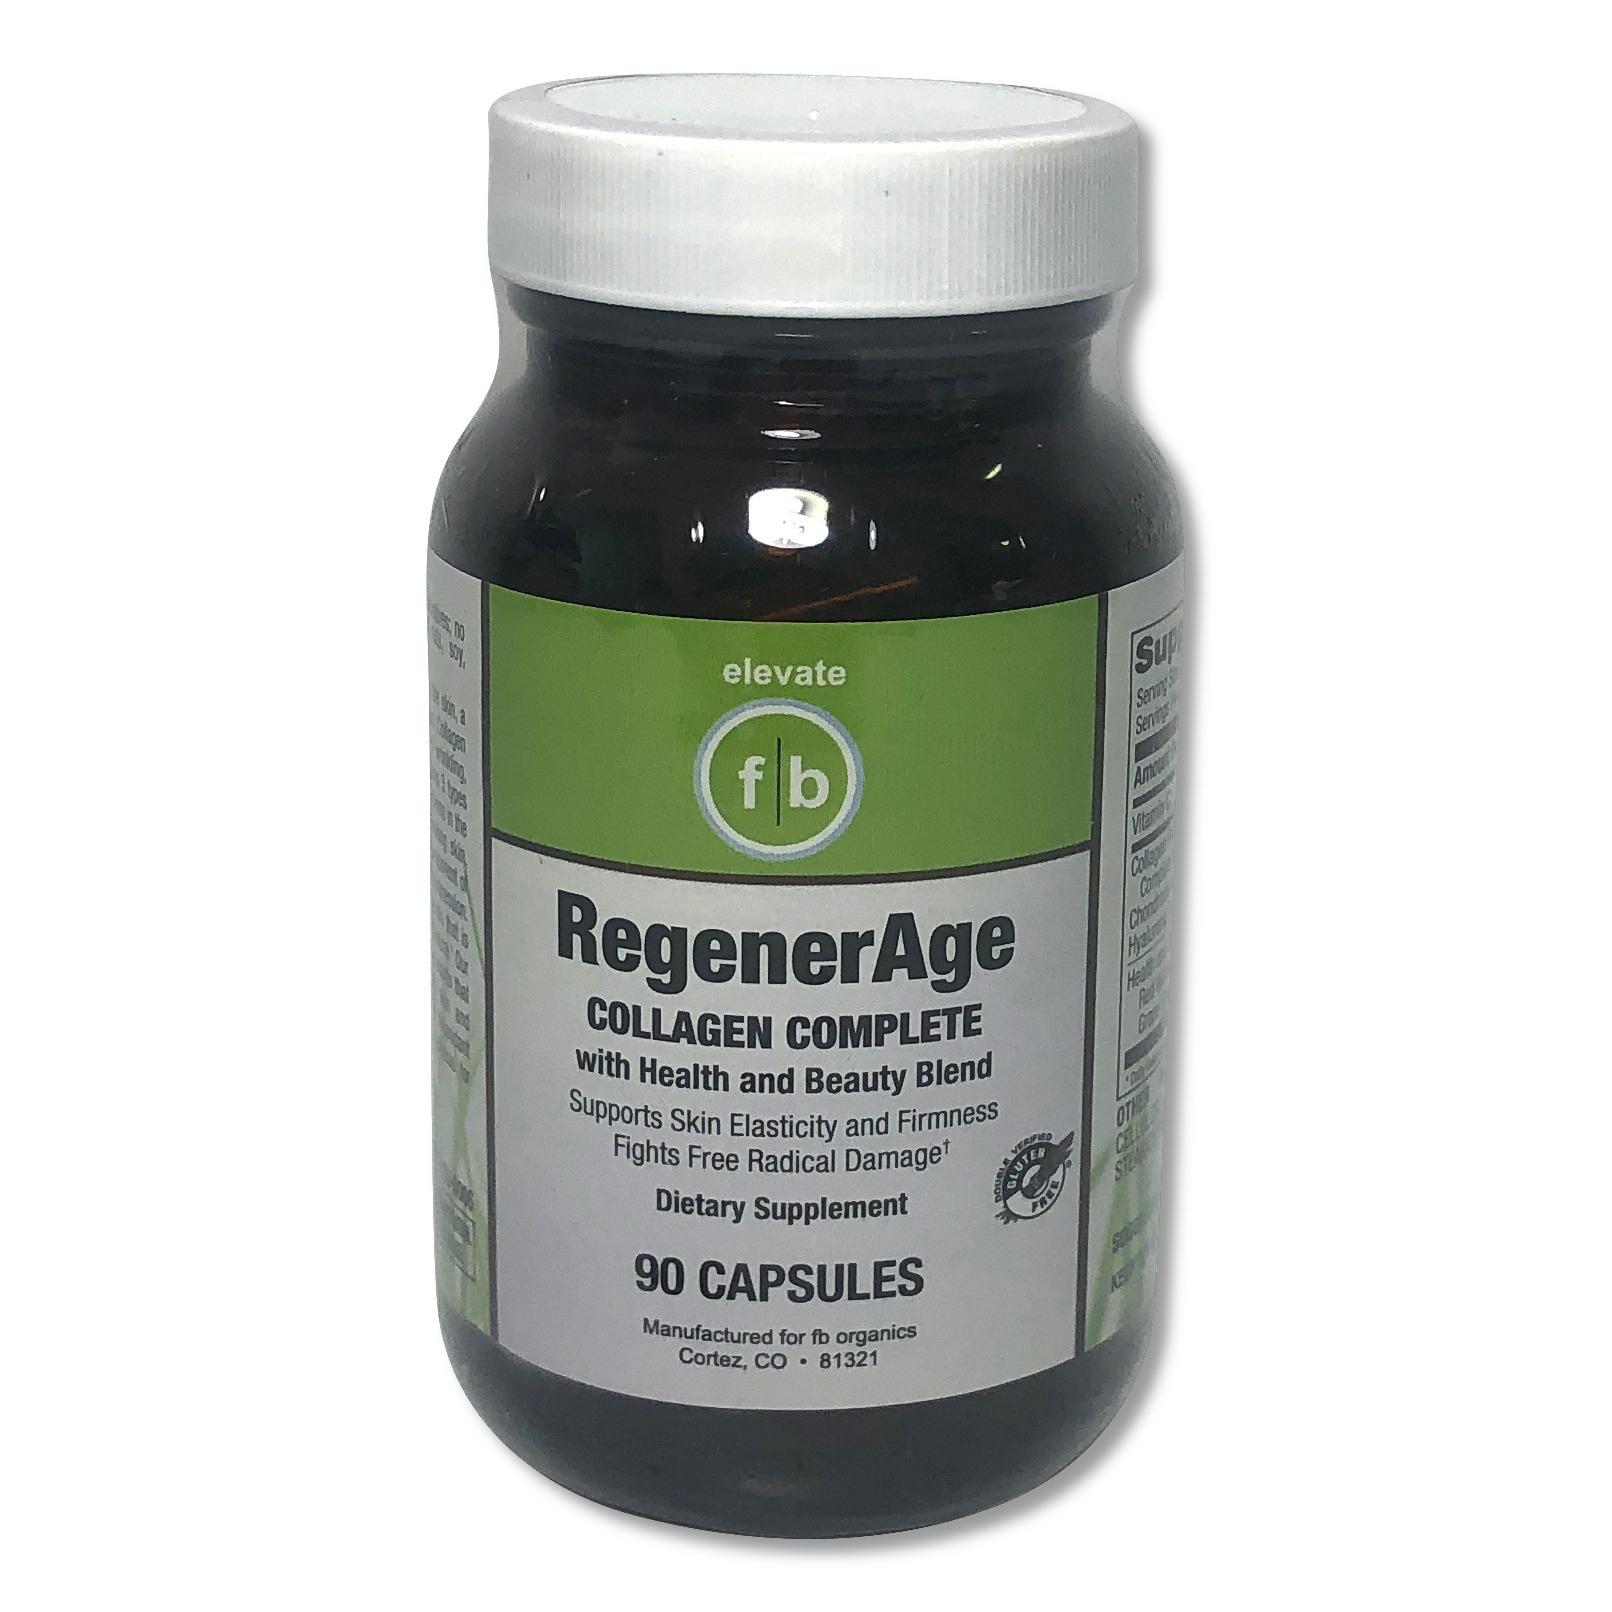 RegenerAge Collagen Complete-1